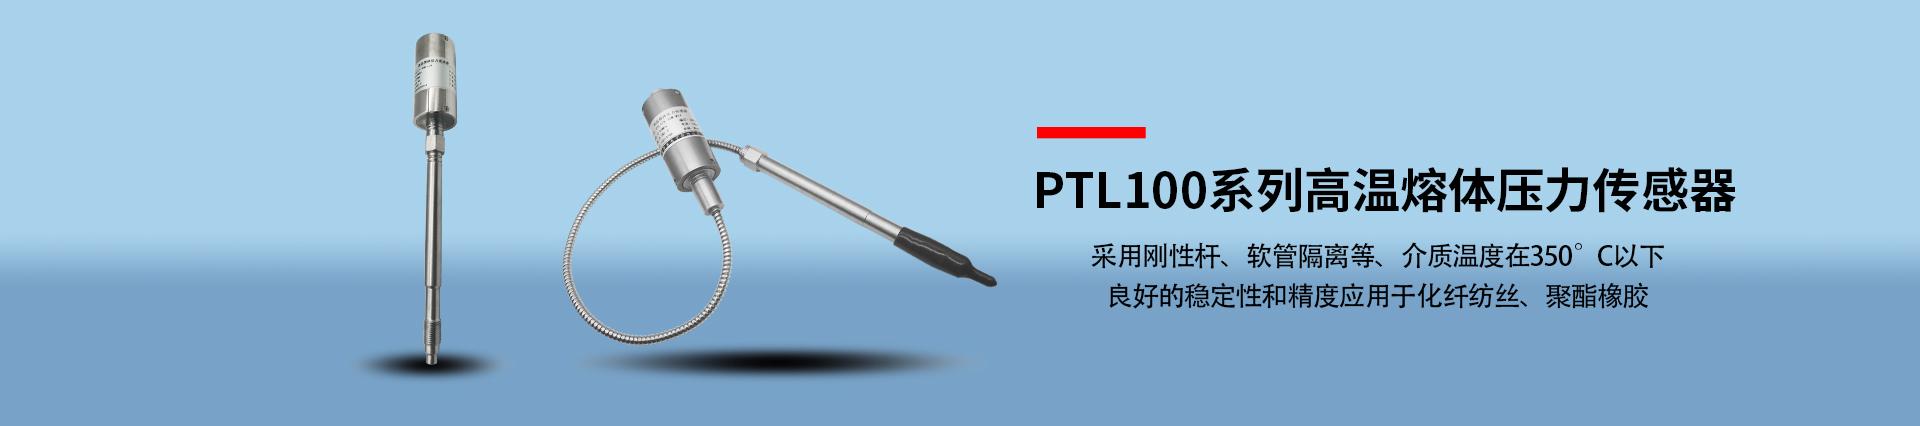 PTL100系列高温熔体压力传感器